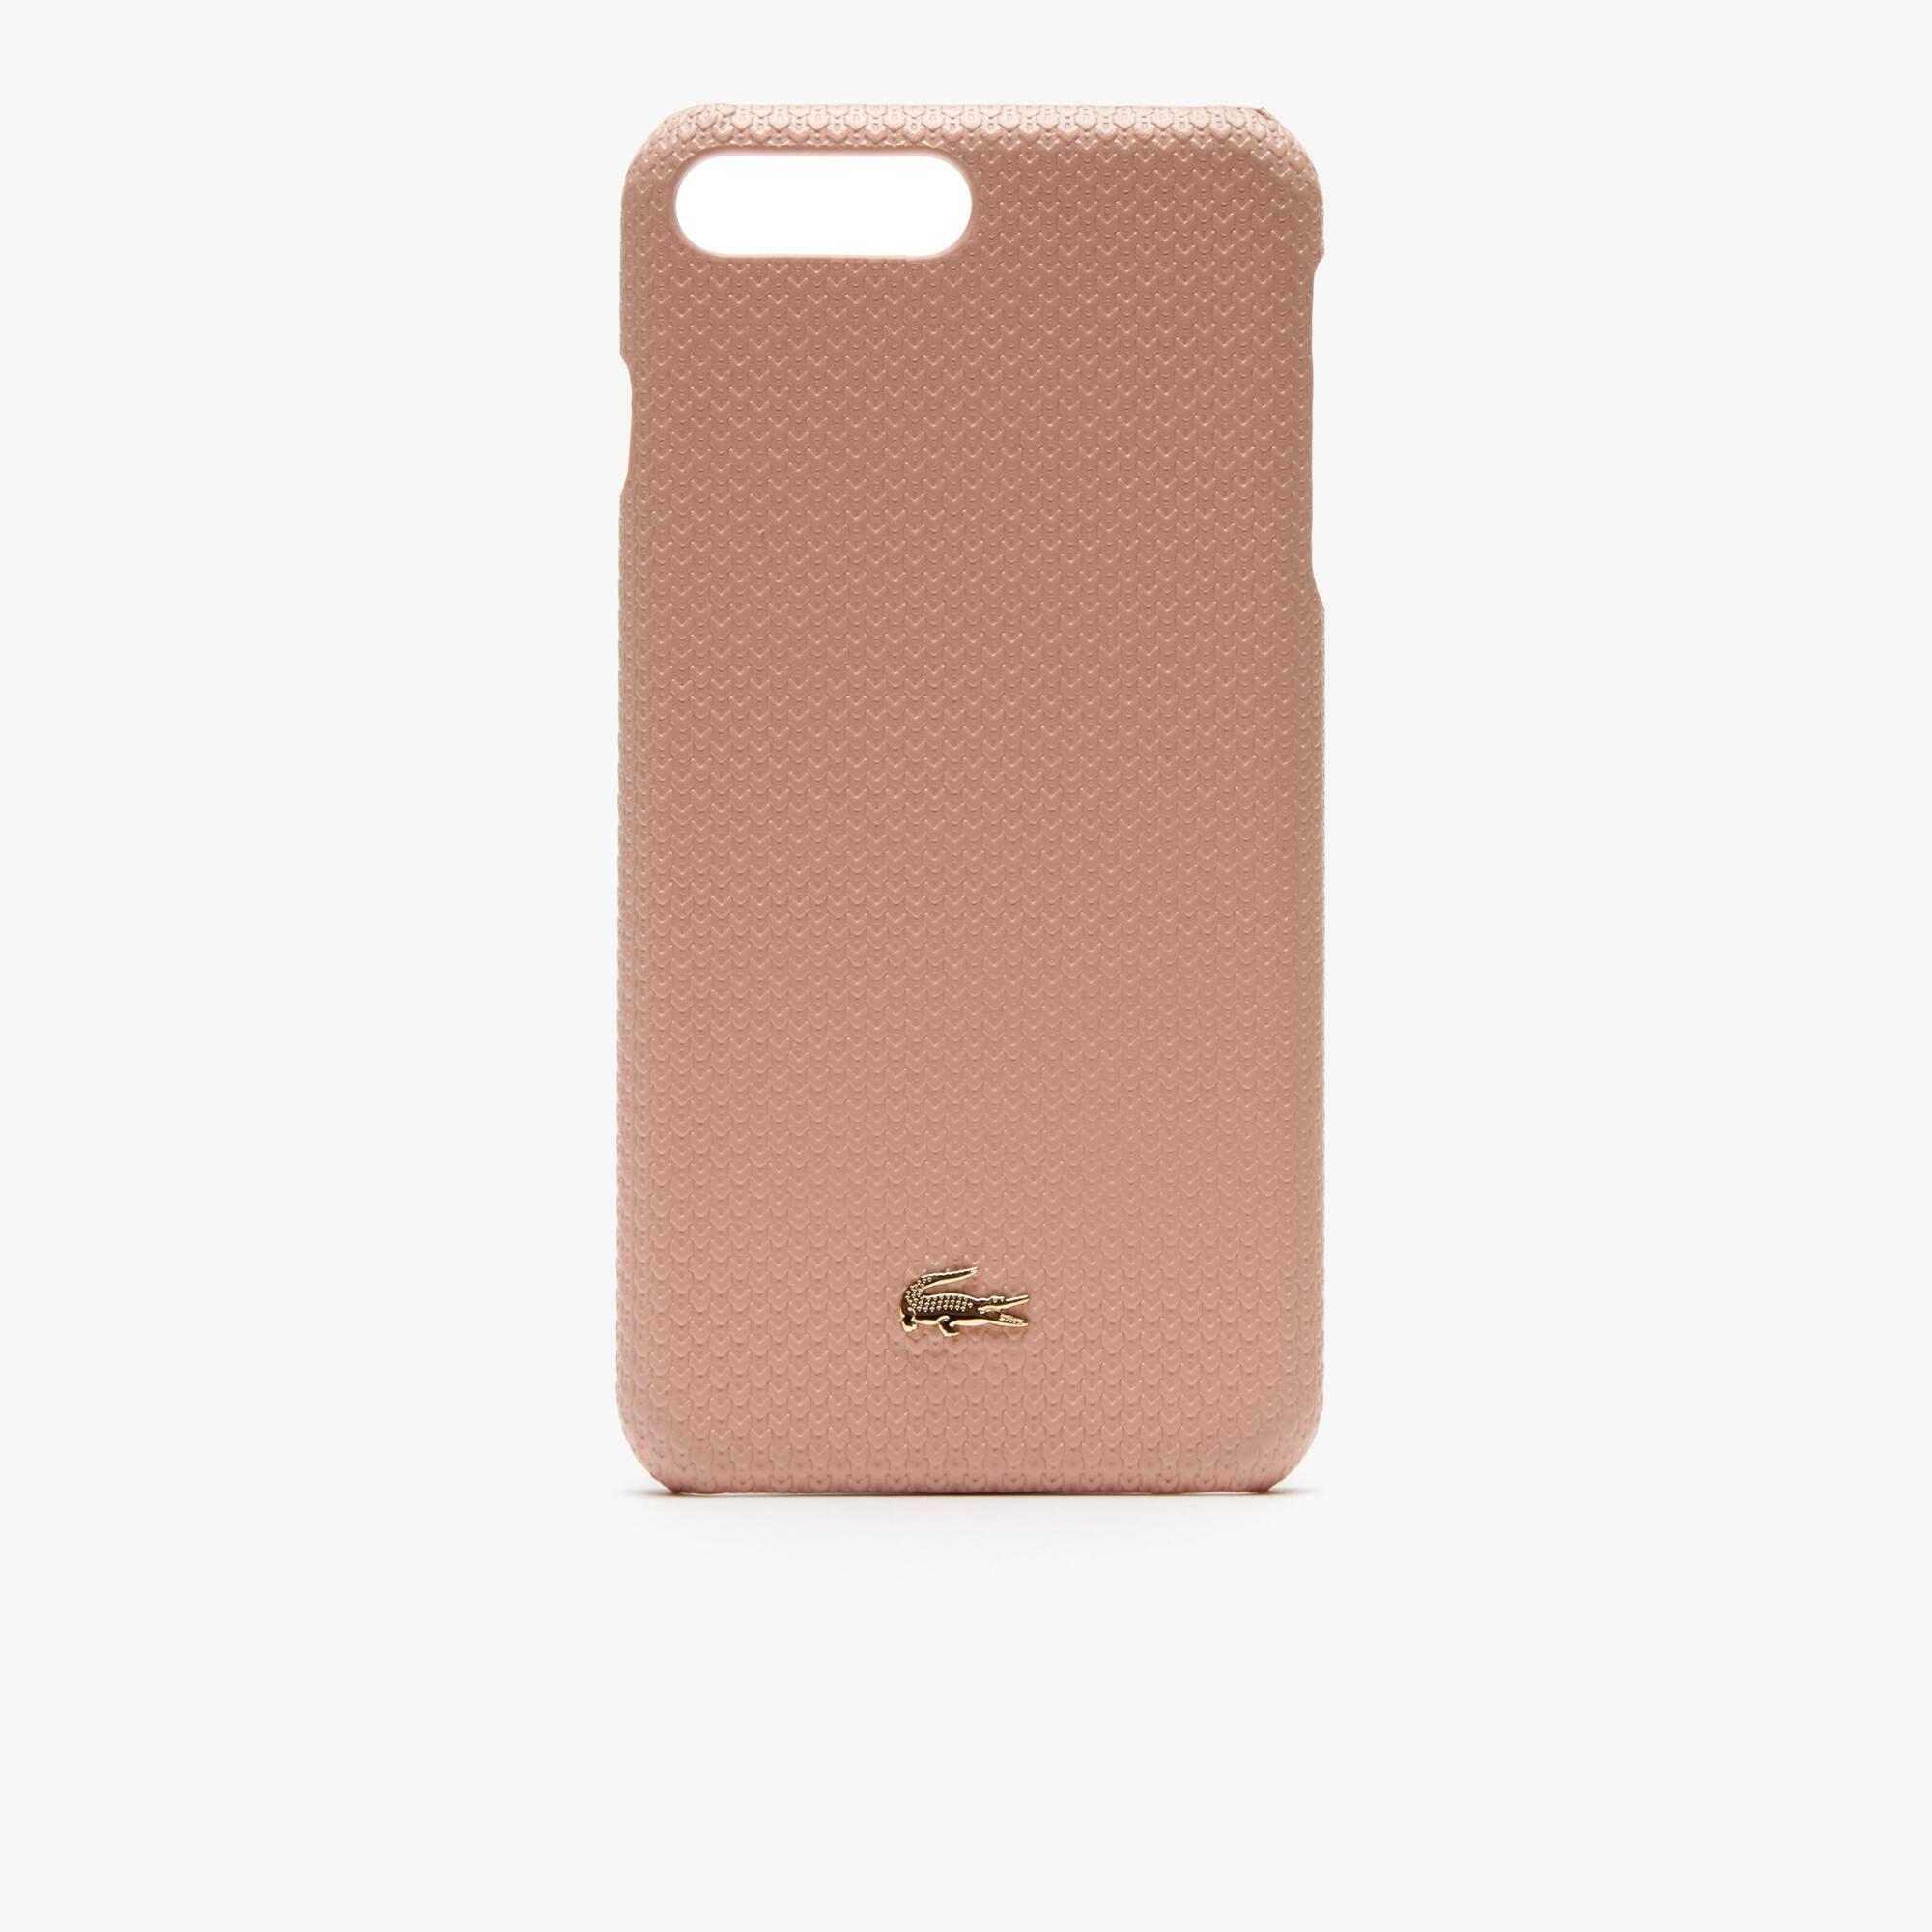 coque iphone 8 silicone lacoste